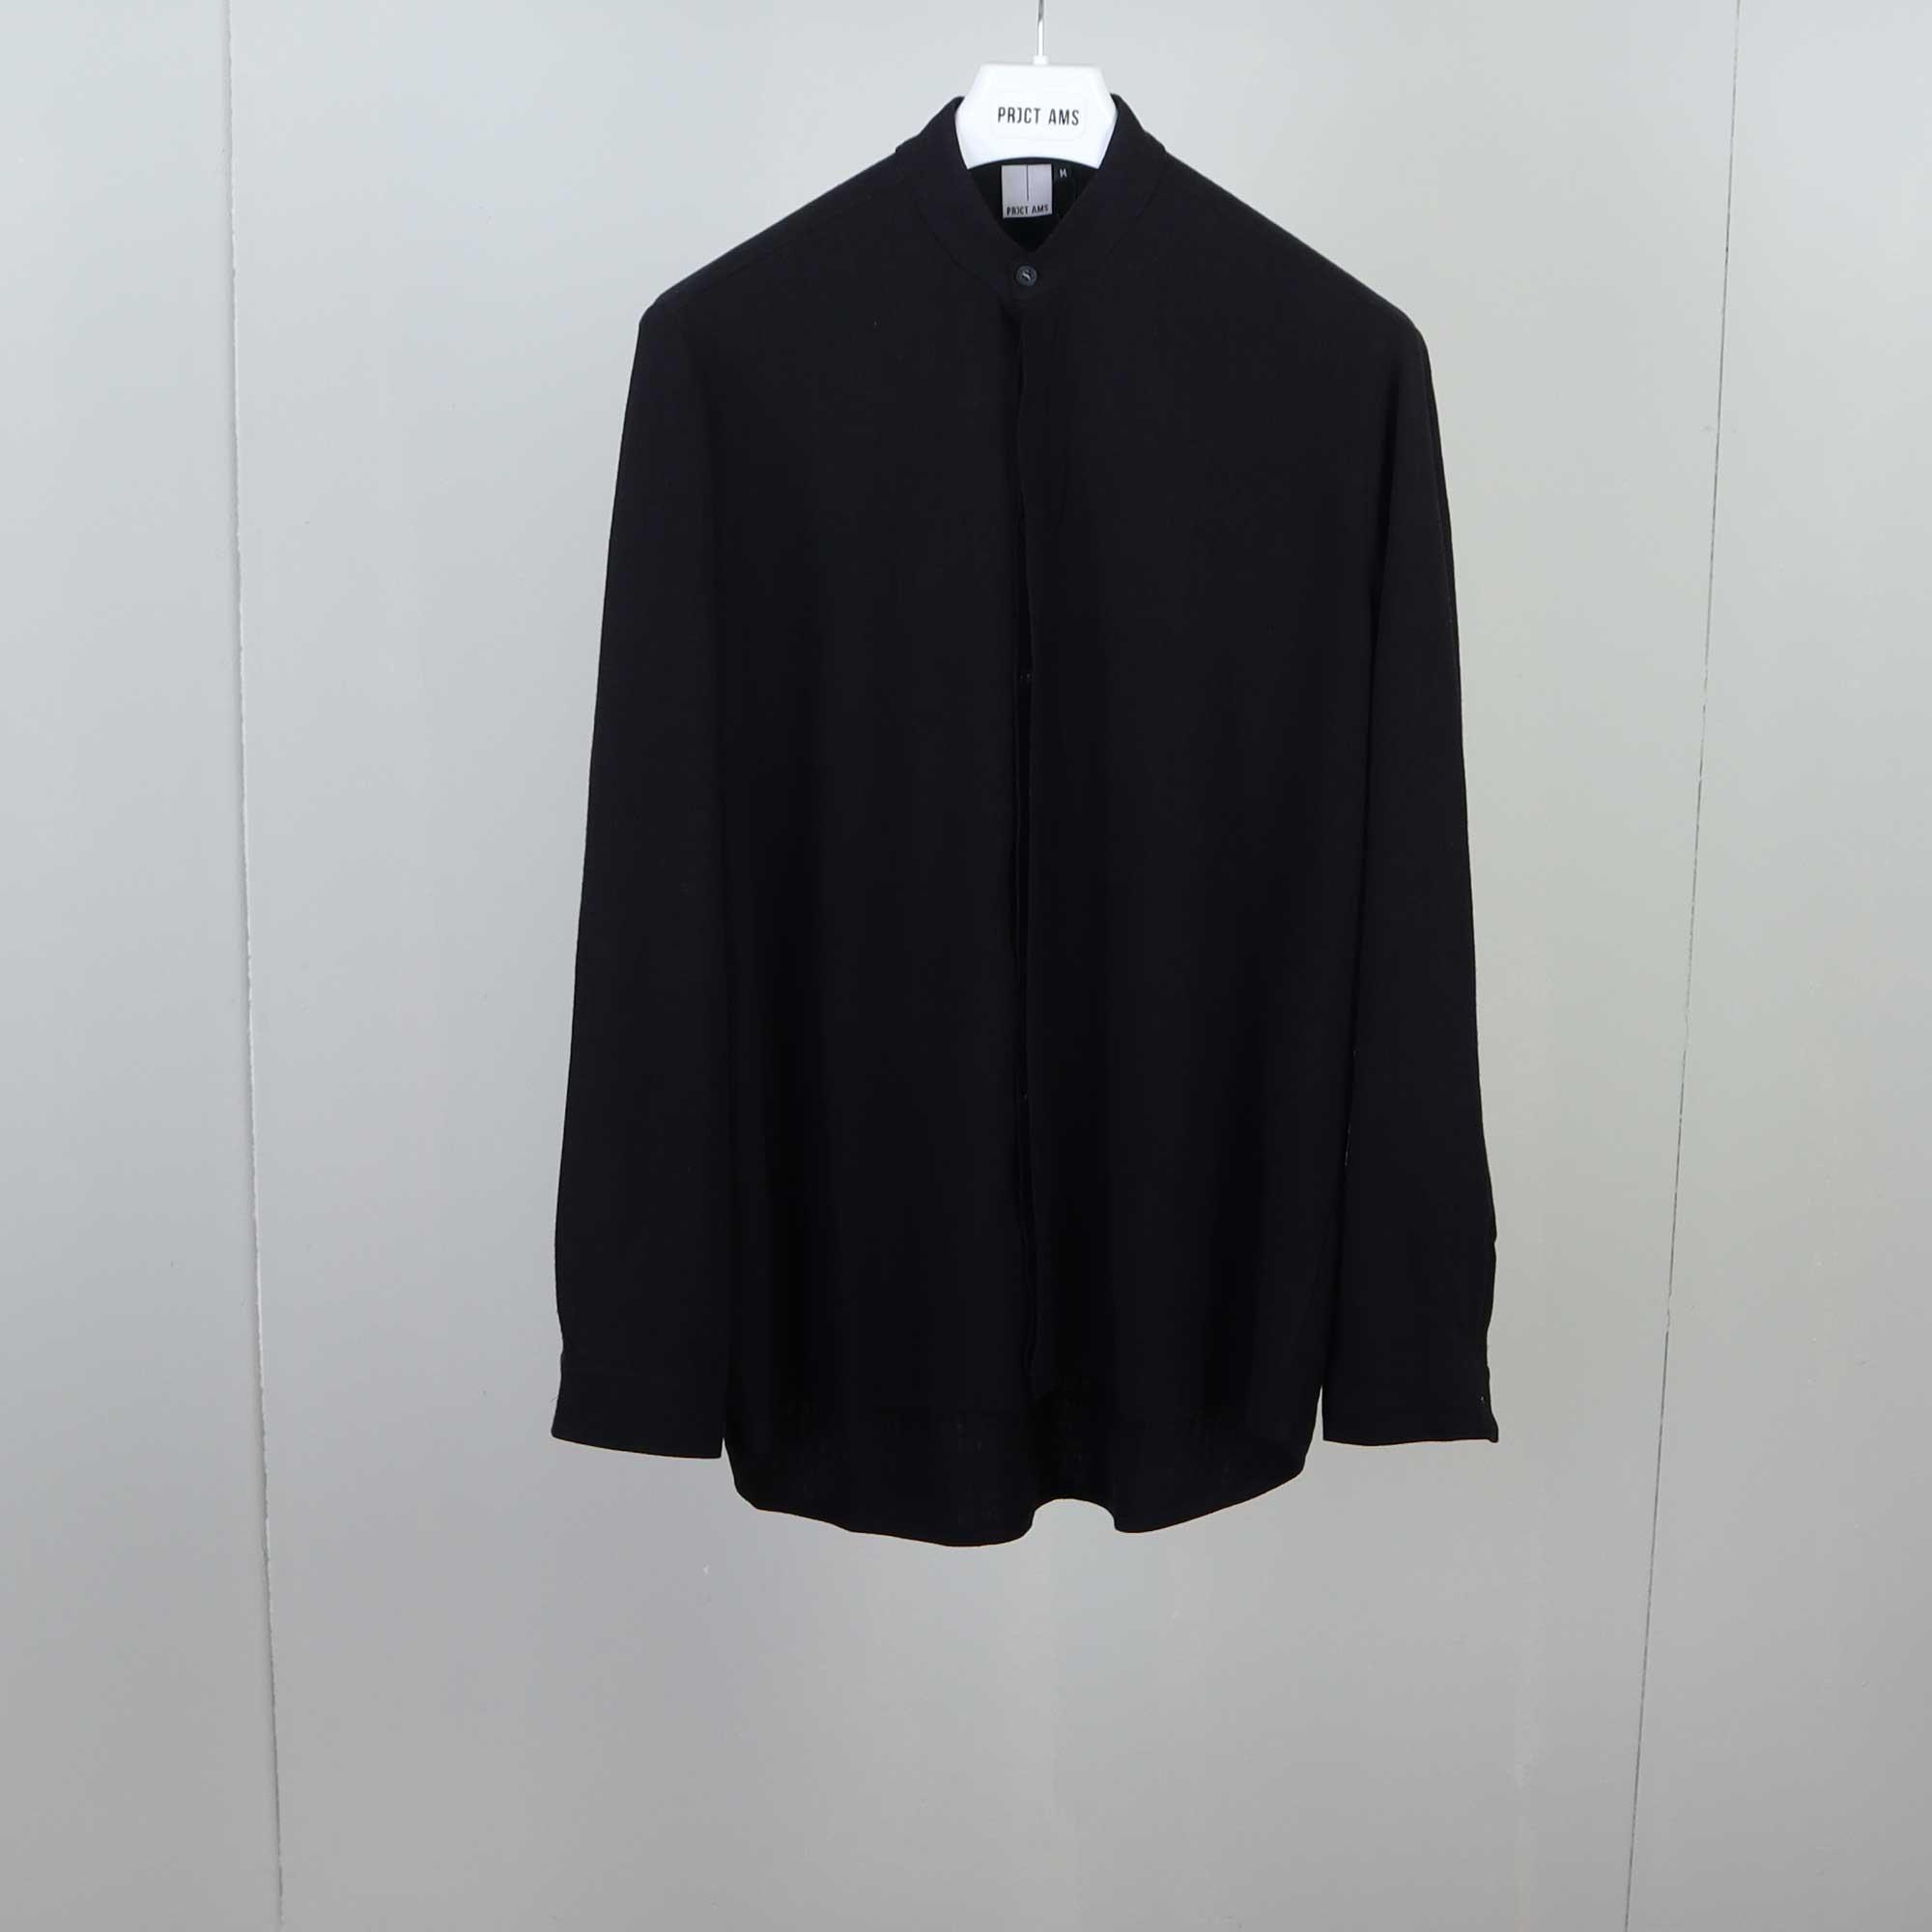 zippy-zwart-5